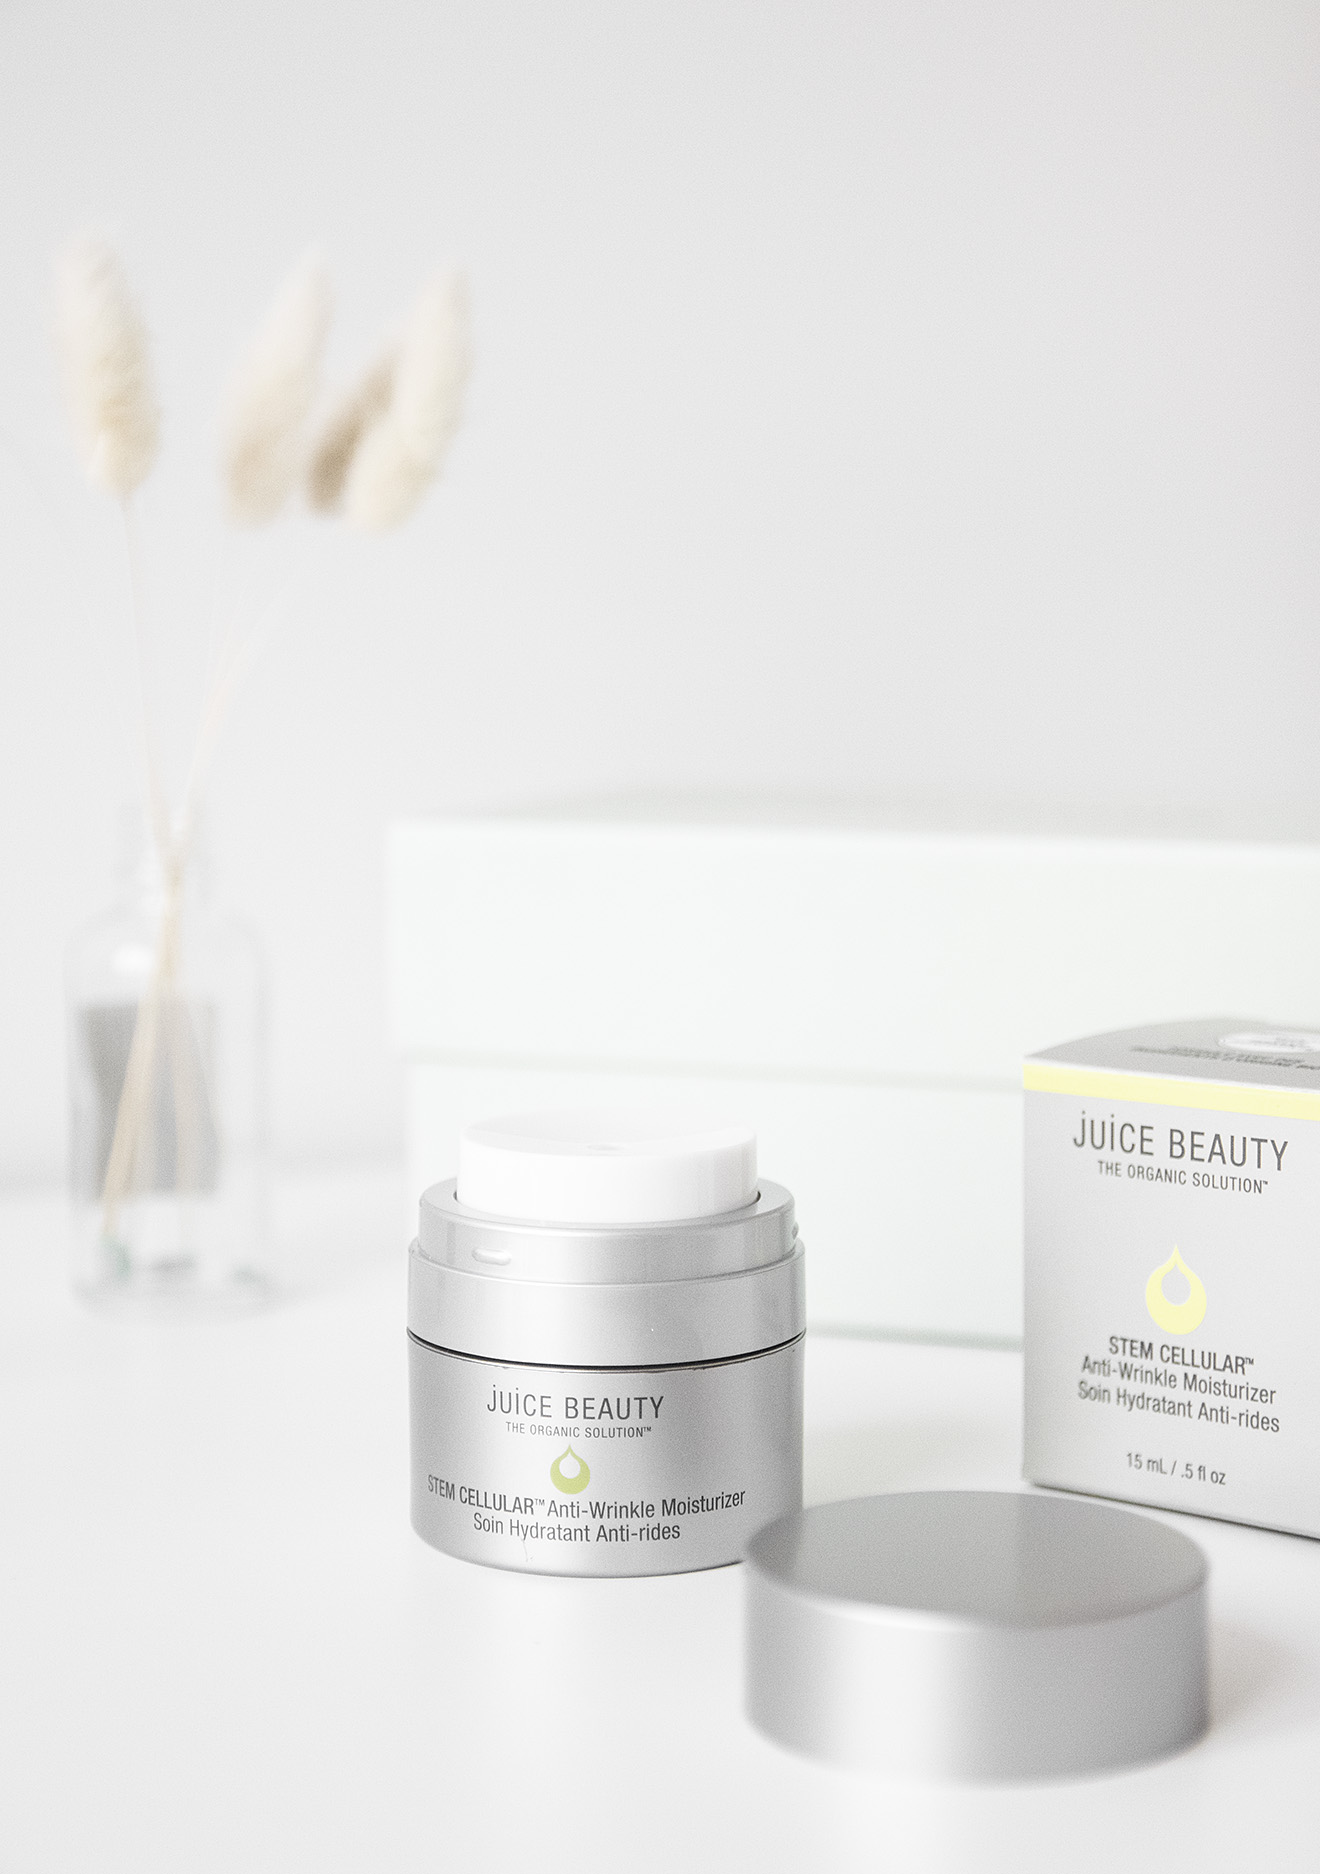 Juice Beauty Stem Cellular Anti Wrinkle Moisturizer